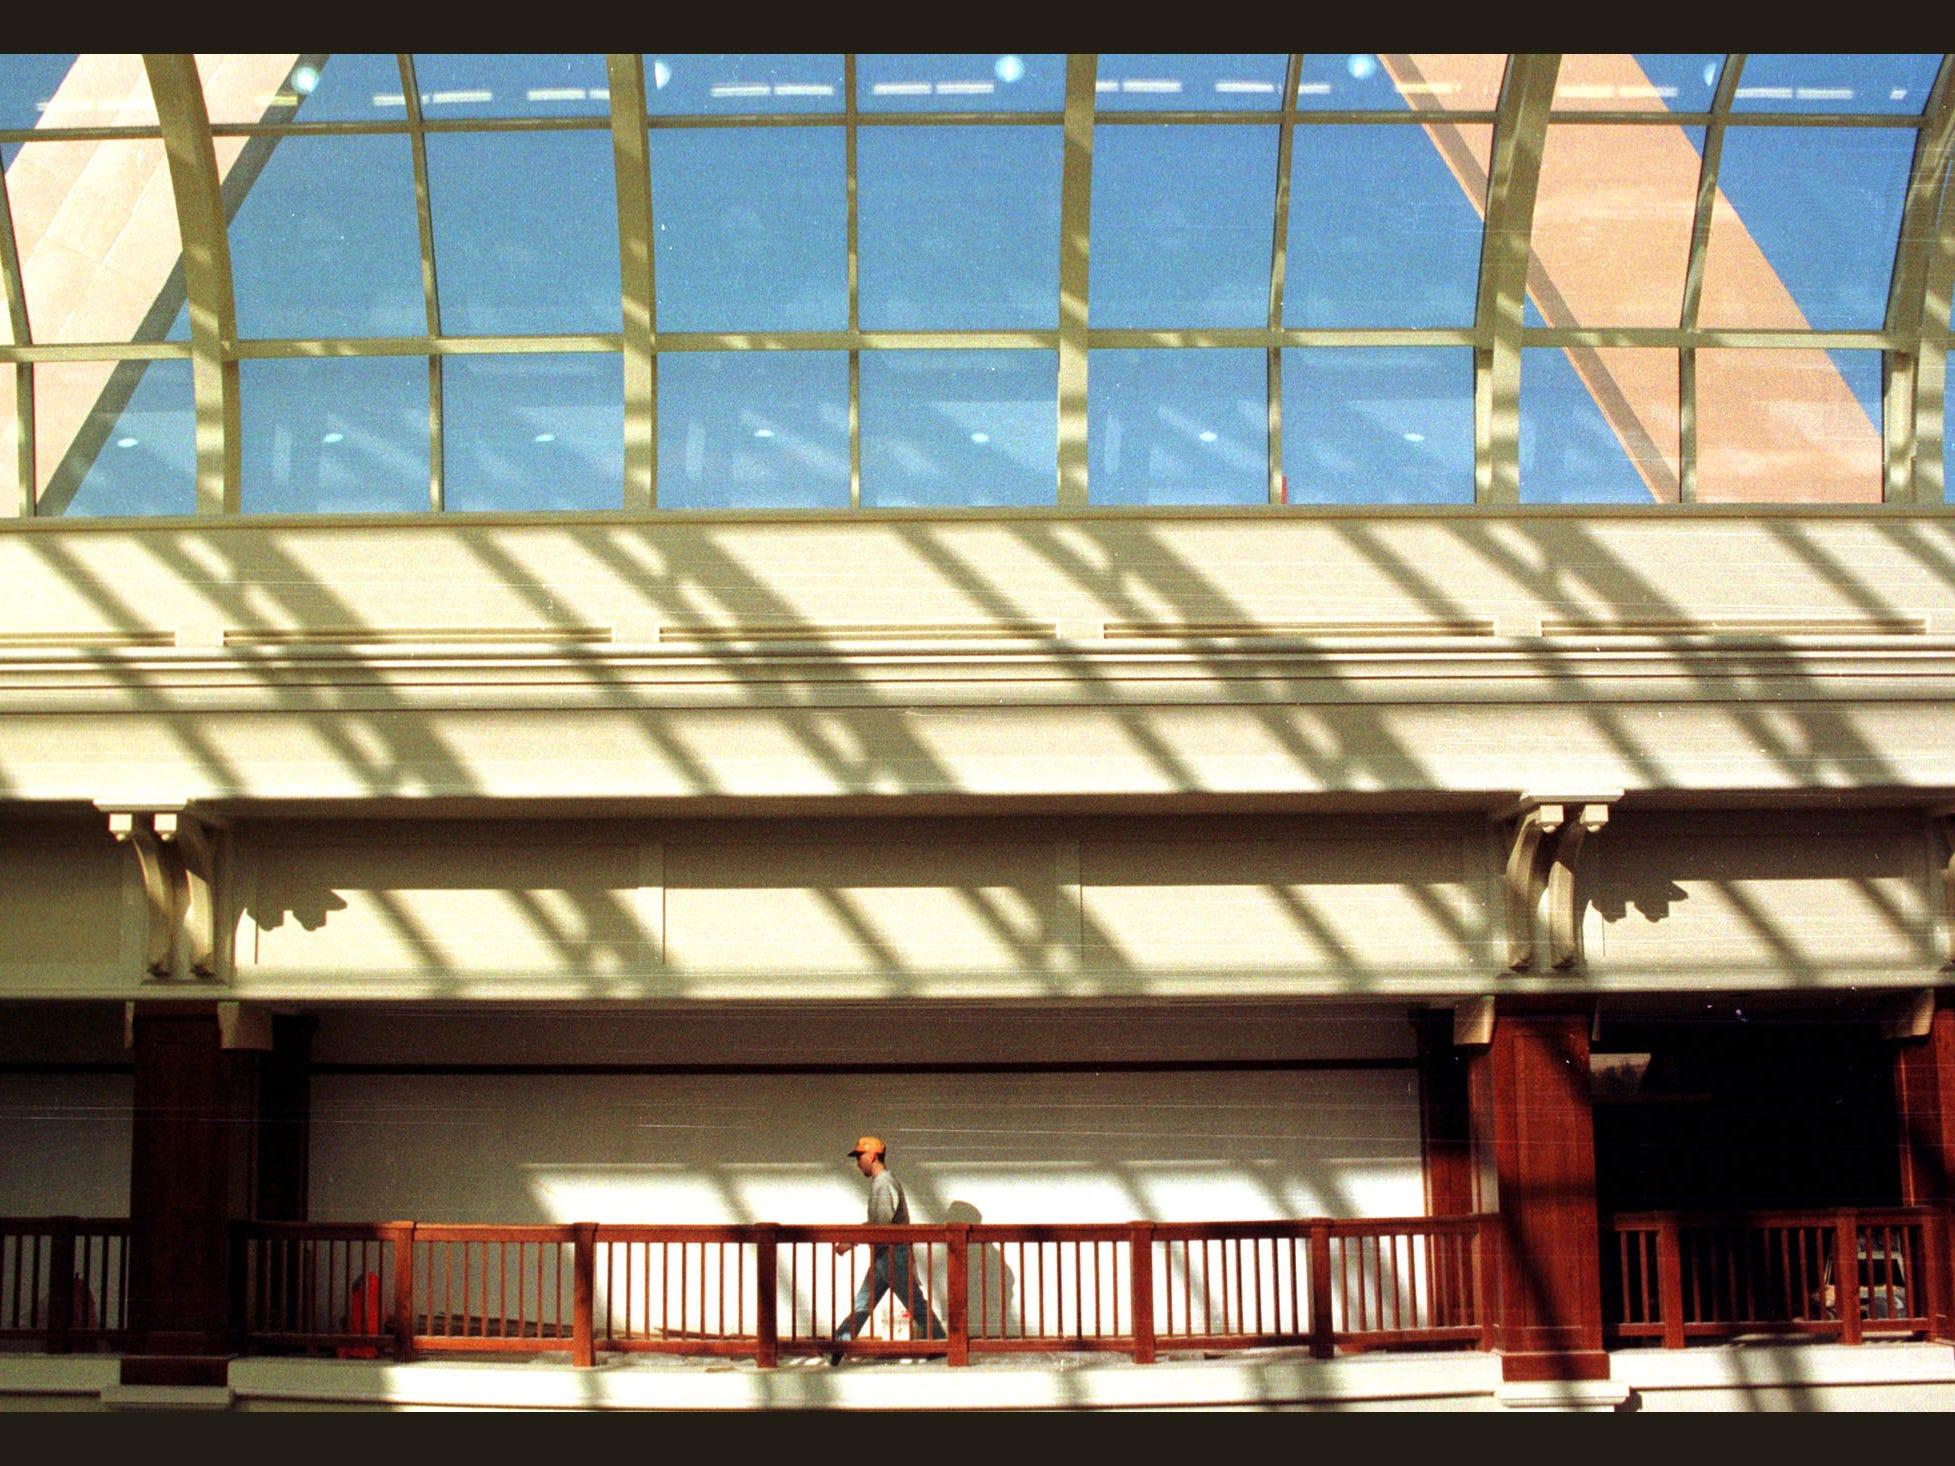 An employee walks beneath the skylight inside the Longaberger Basket Building in February of 1998.